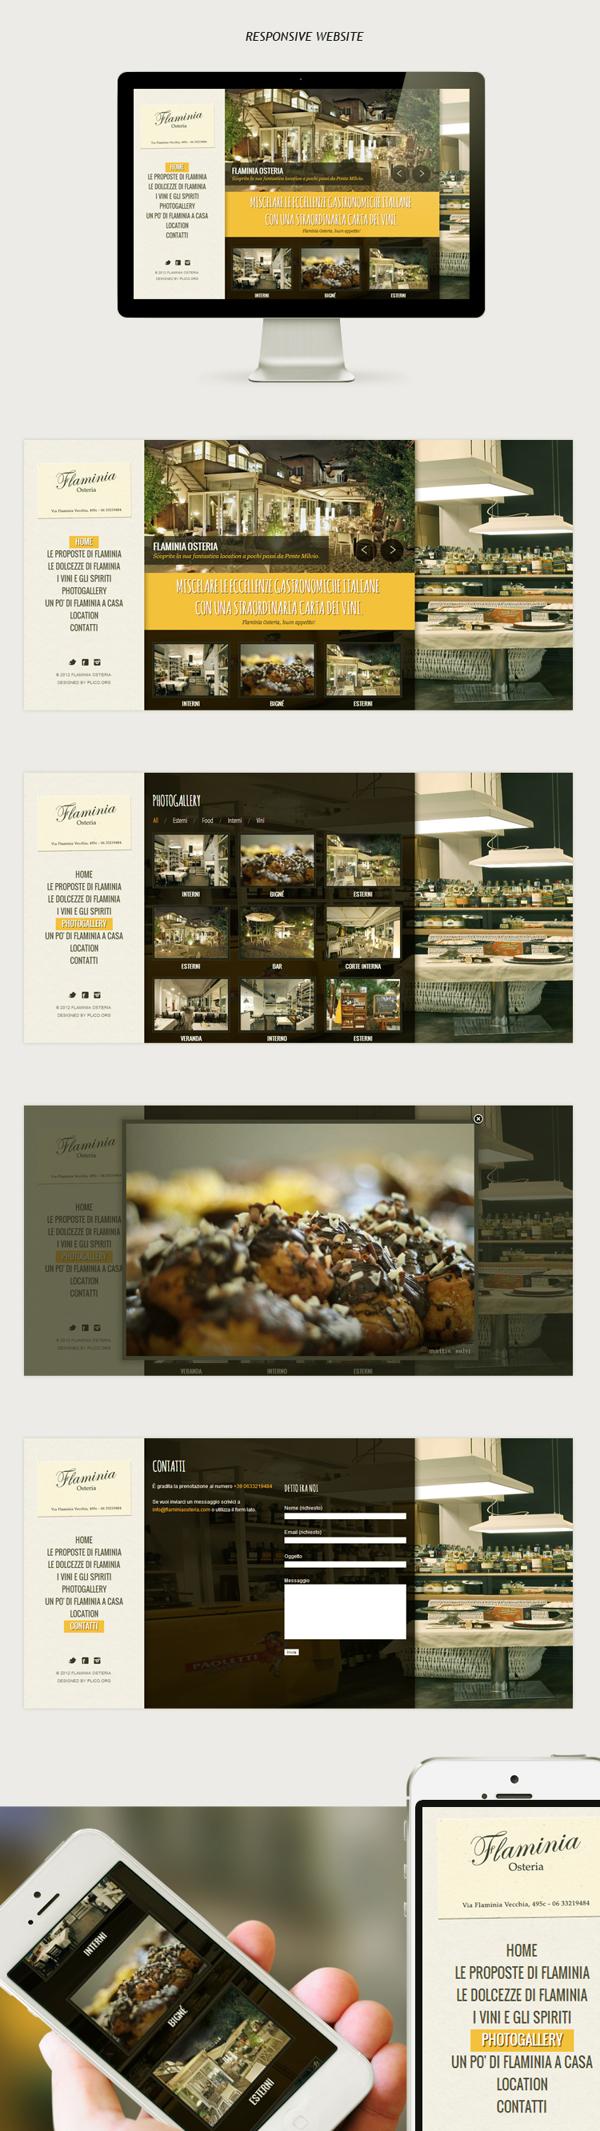 Restaurant Website By Renato Proia Via Behance Unique Website Layout Web Layout Design Restaurant Website